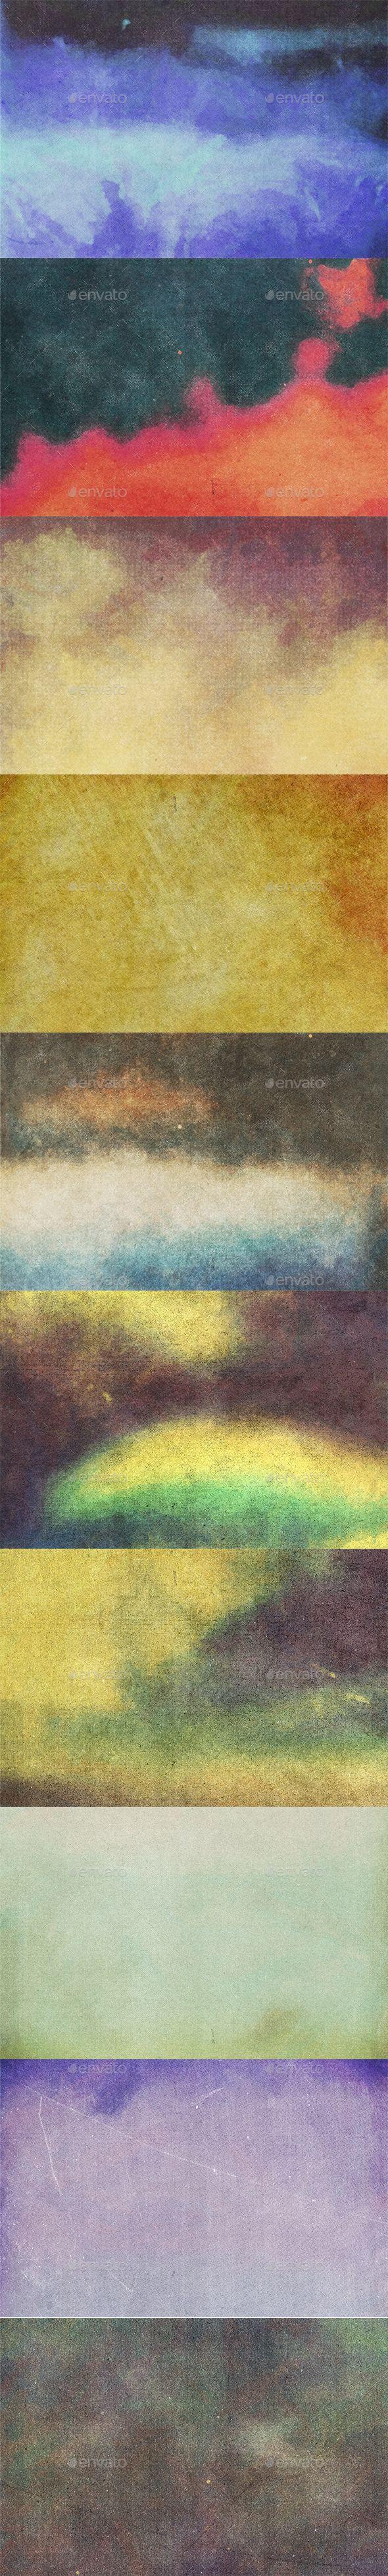 10 Vintage Halftone #Watercolor Textures - #Art #Textures